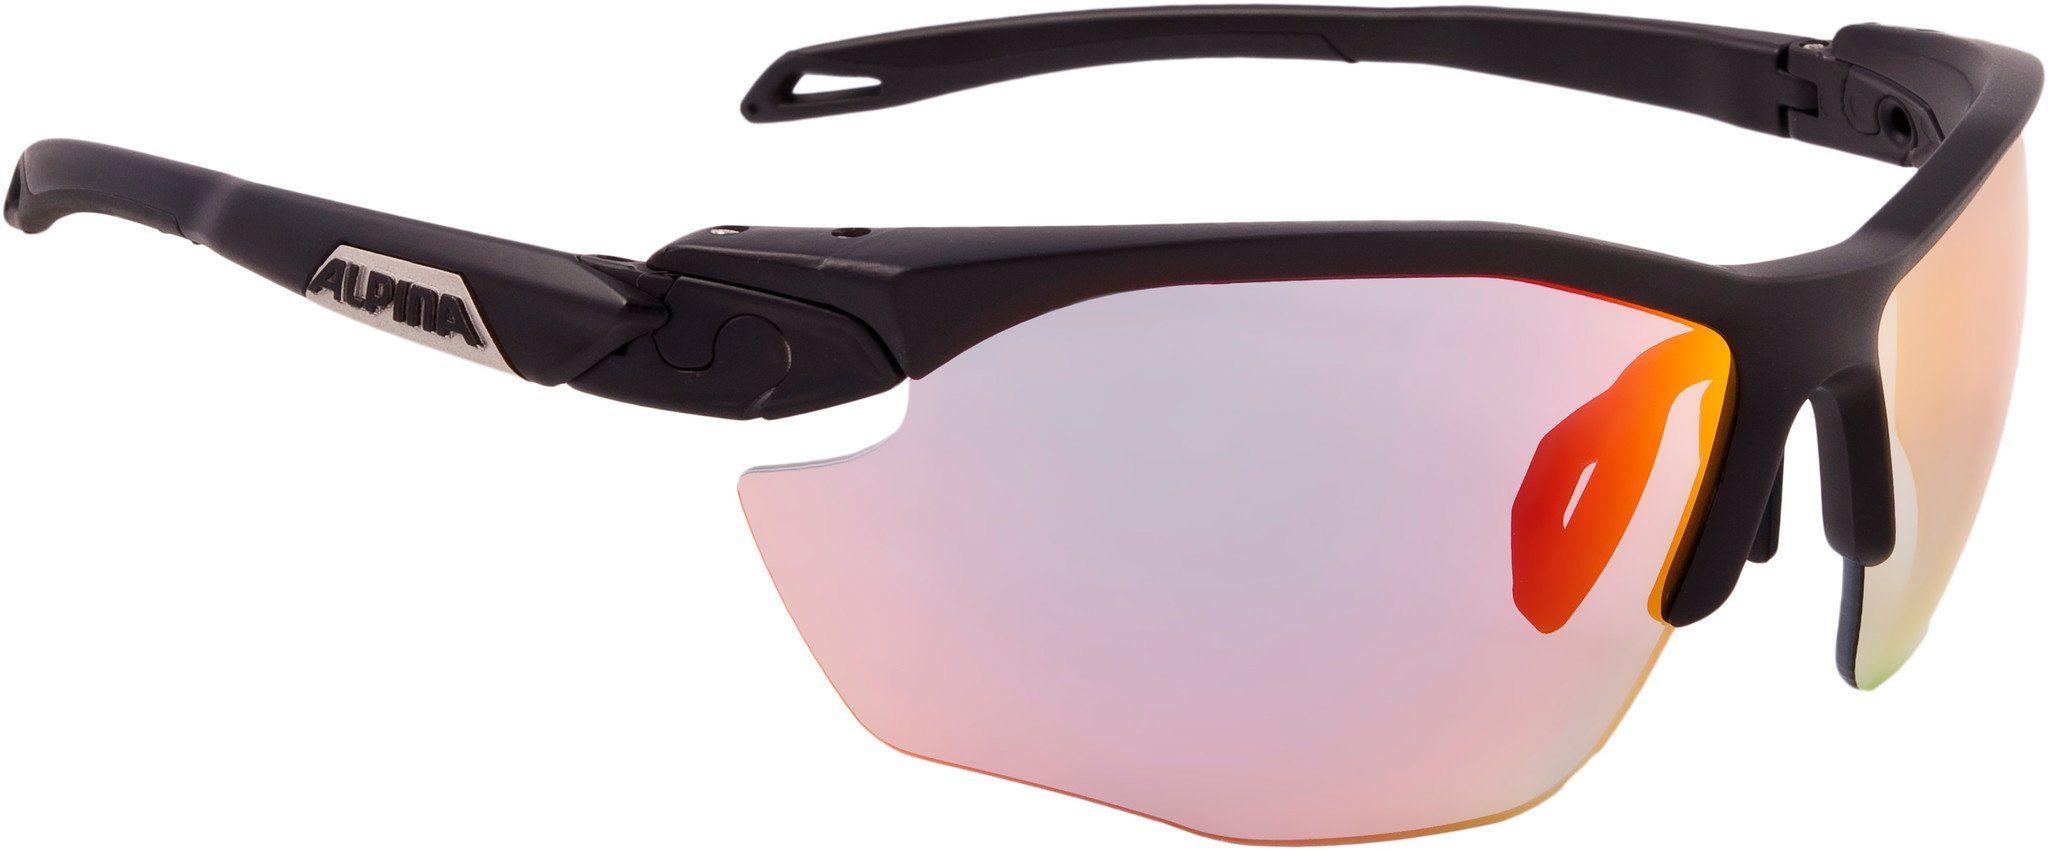 Alpina Sports Sportbrille »Twist Five HR QVM+ Glasses«